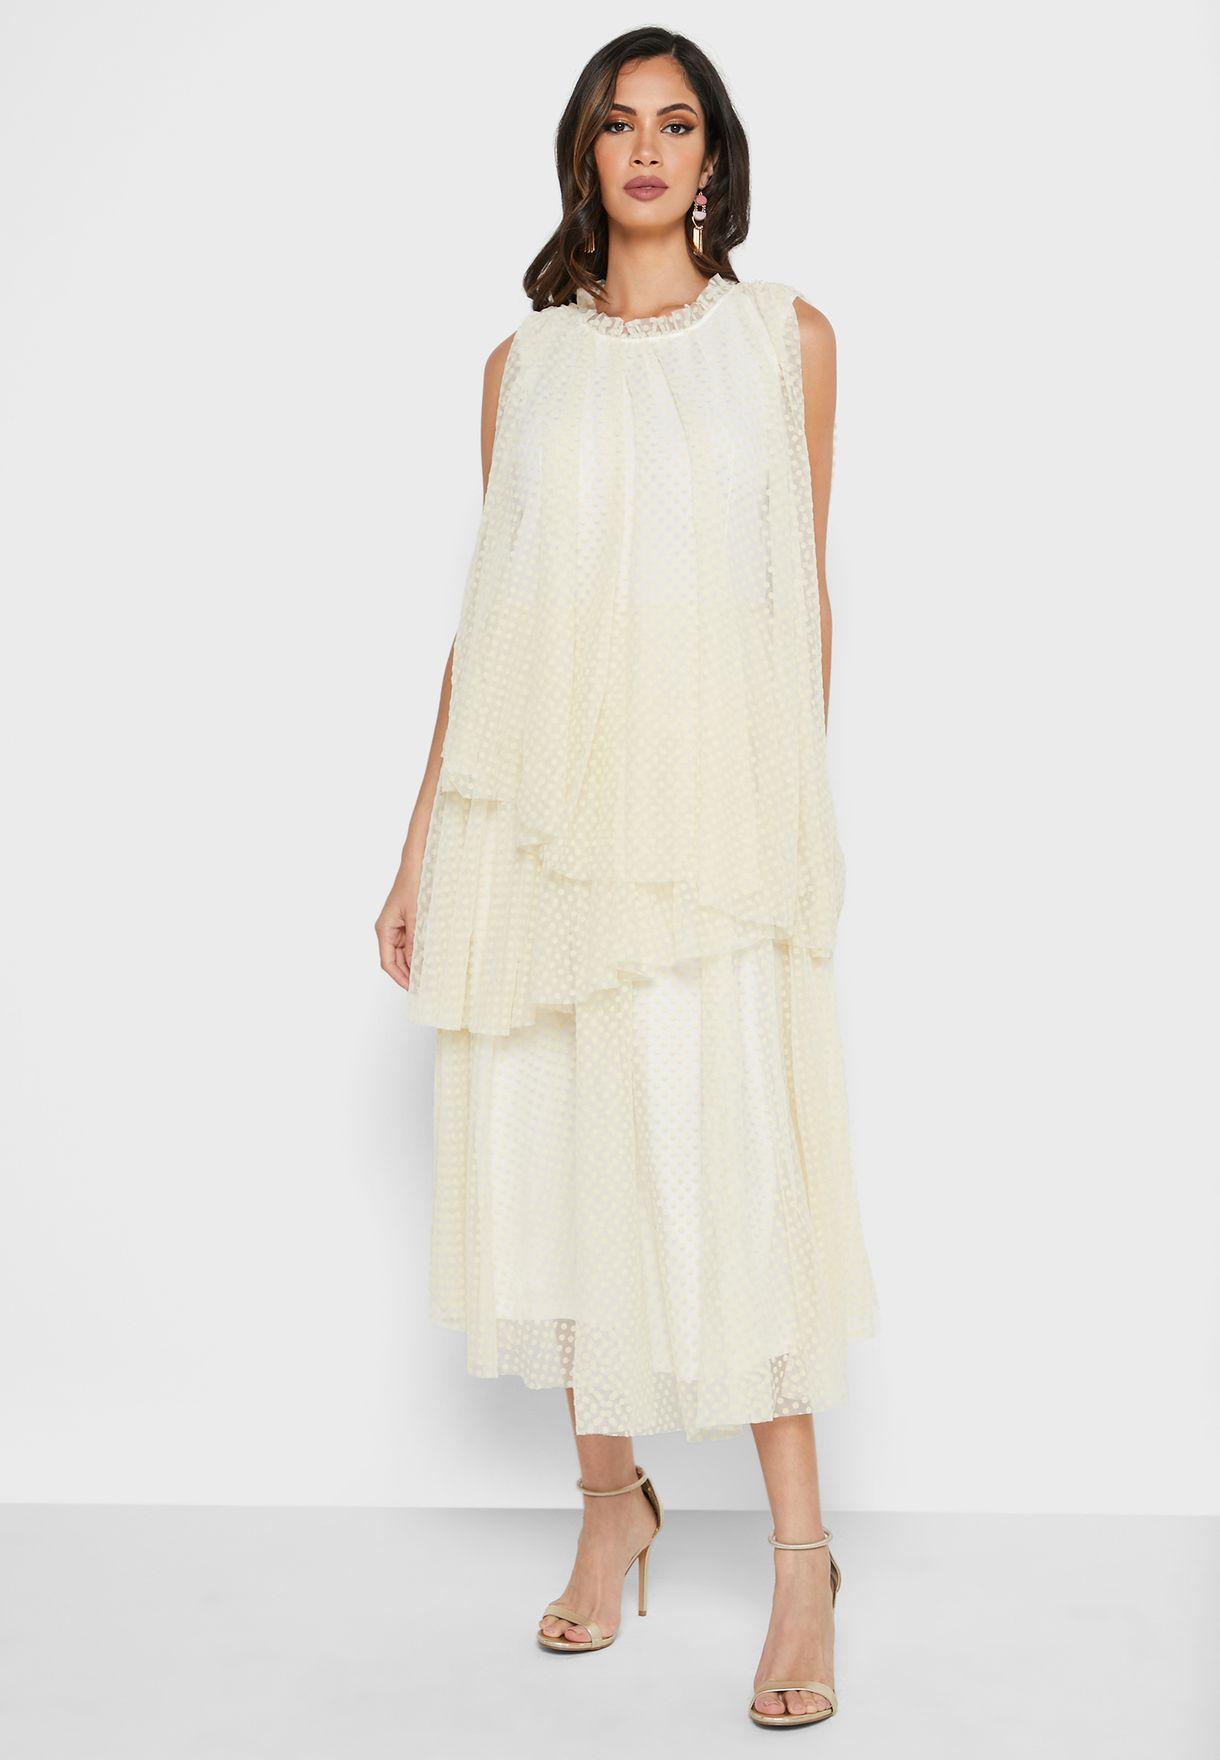 Asymmetric Layered Mesh Dress